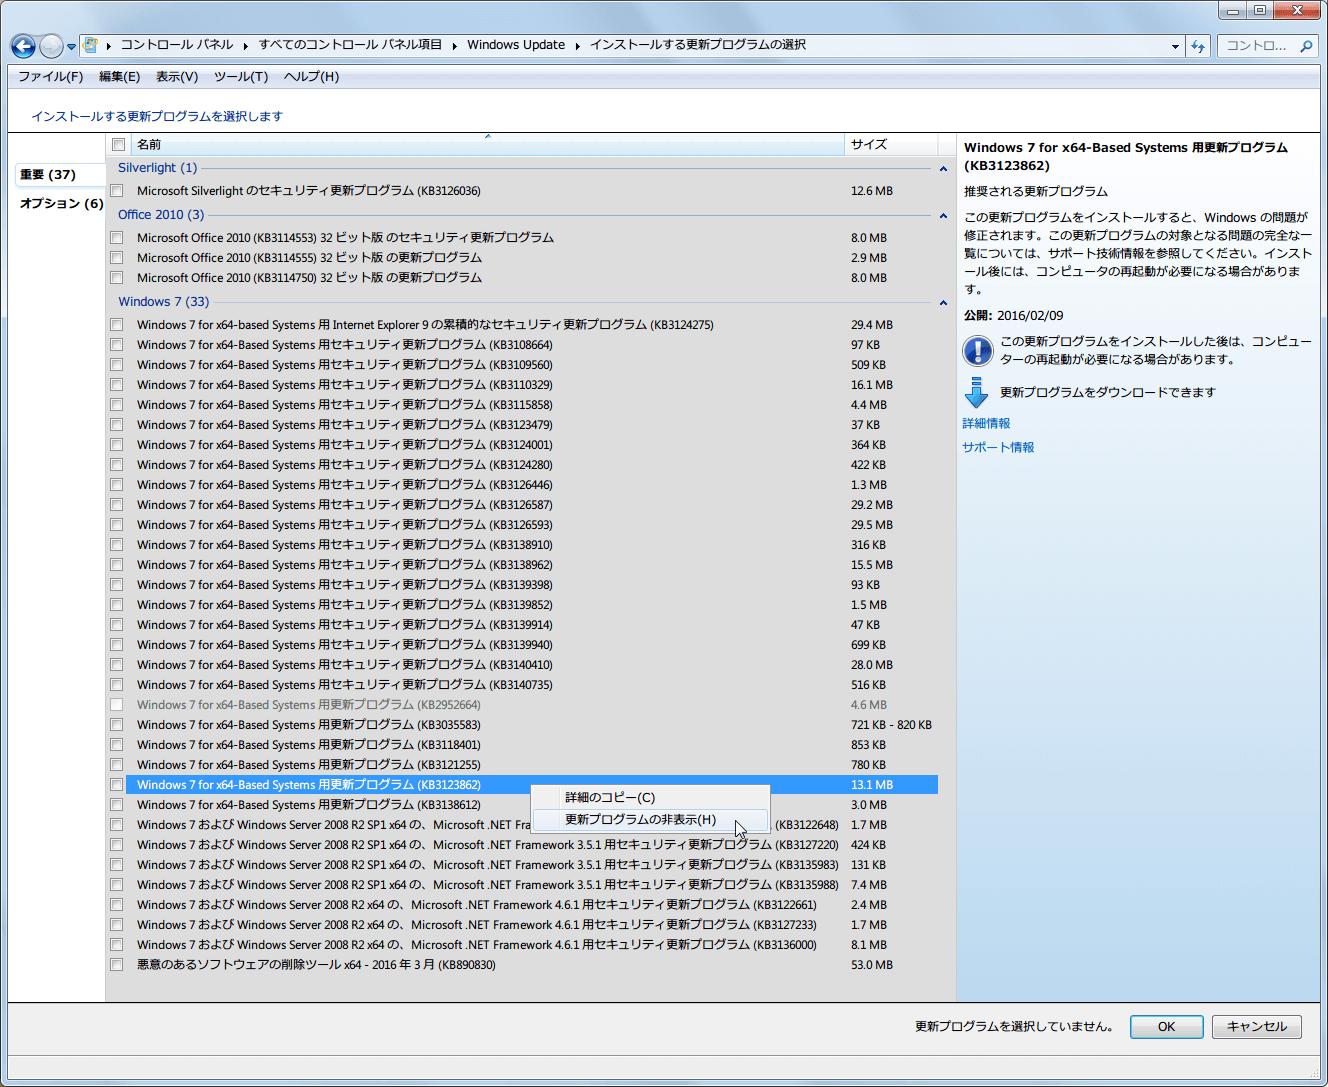 Windows 7 64bit Windows Update 重要 2016年2月9日公開 KB3123862 更新プログラムの非表示